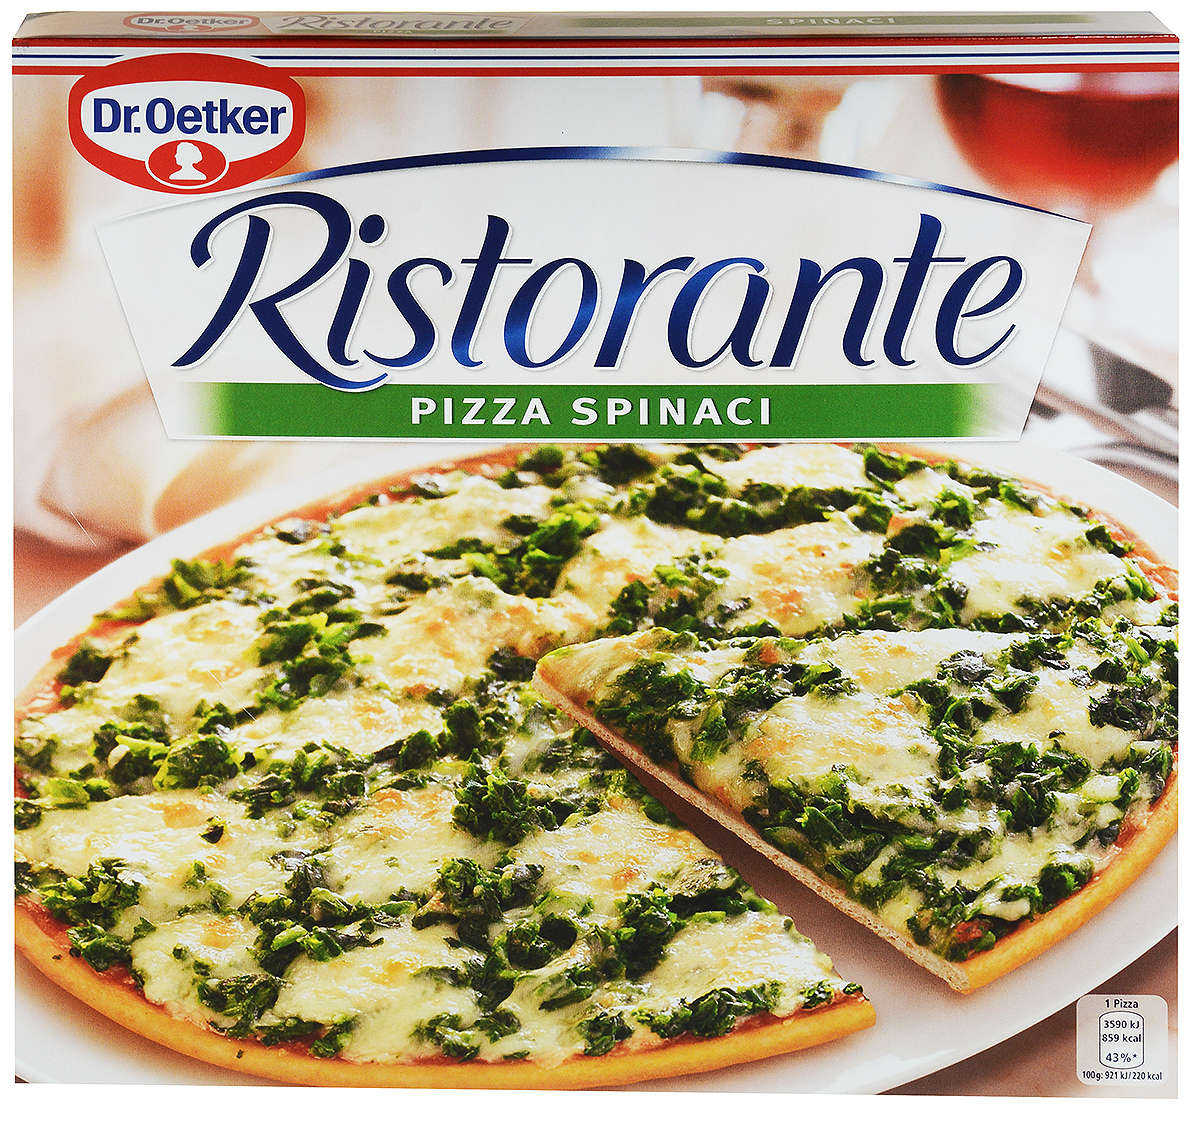 Dr.Oetker Пицца Ristorante Шпинат, 390 г молочная смесь friso фрисолак 2 с 6 мес 700 гр